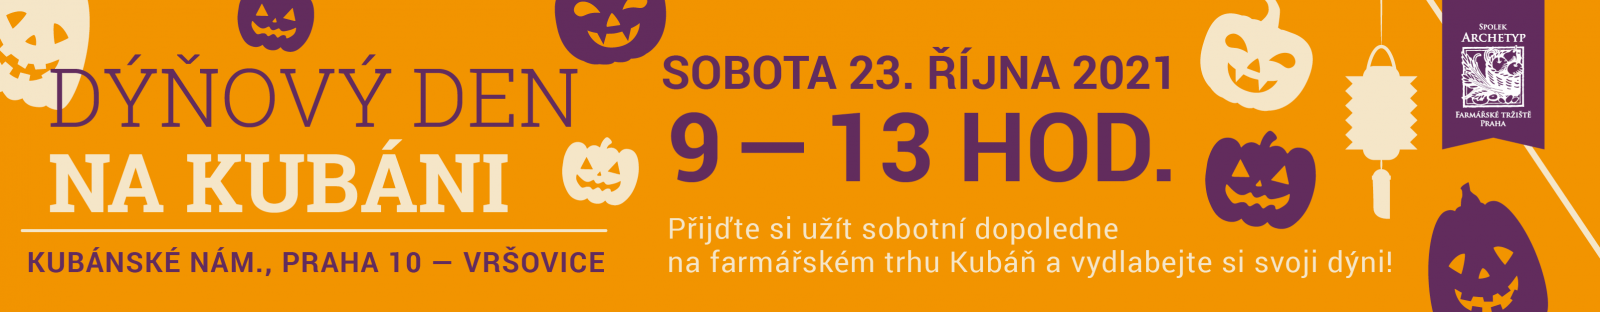 https://www.farmarsketrziste.cz/wp-content/uploads/dyne-2021-770x150-web.png